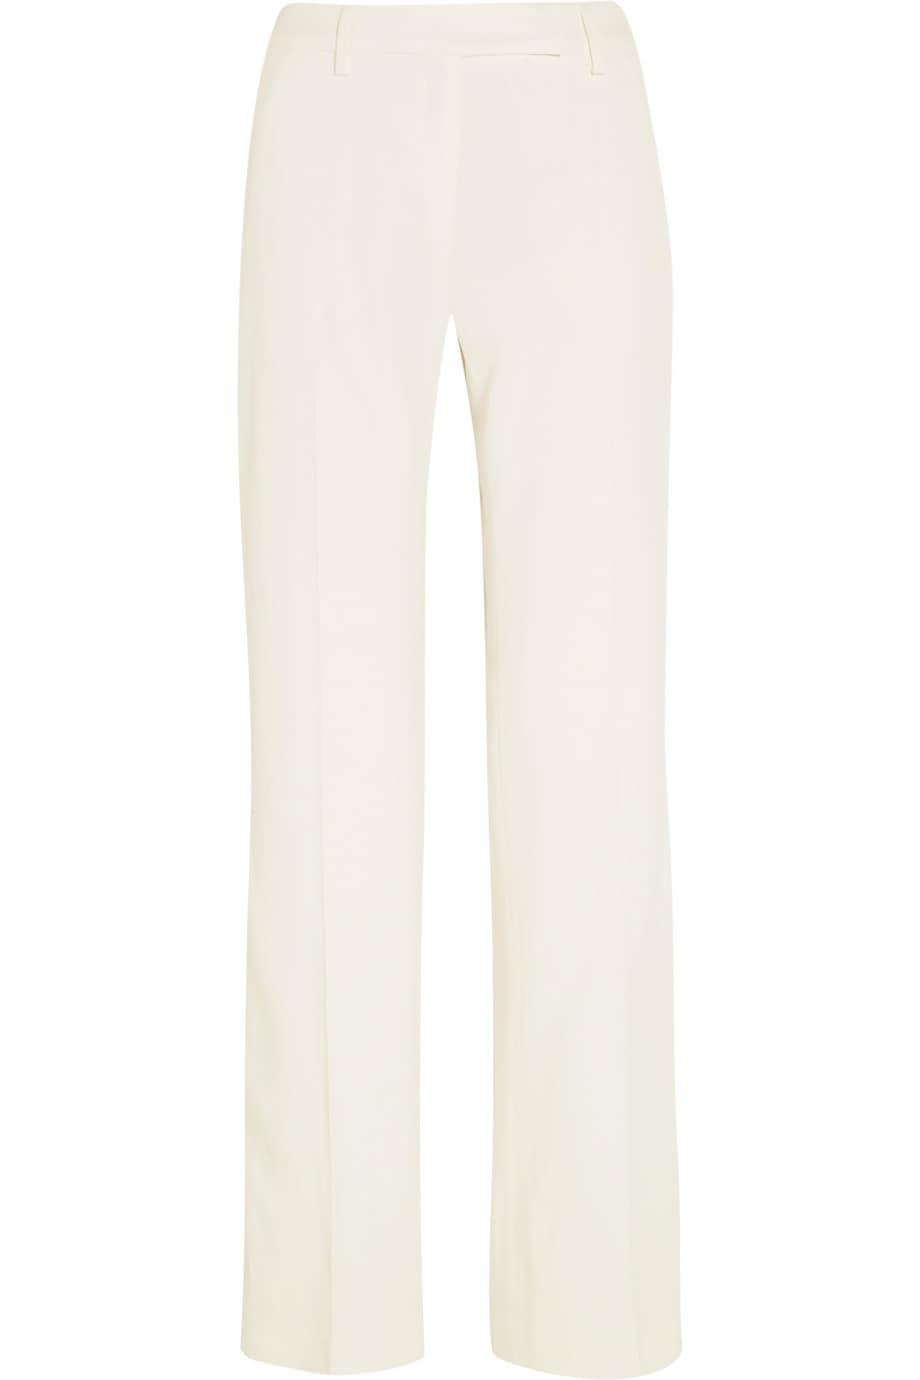 altuzarra pantaloni bianchi